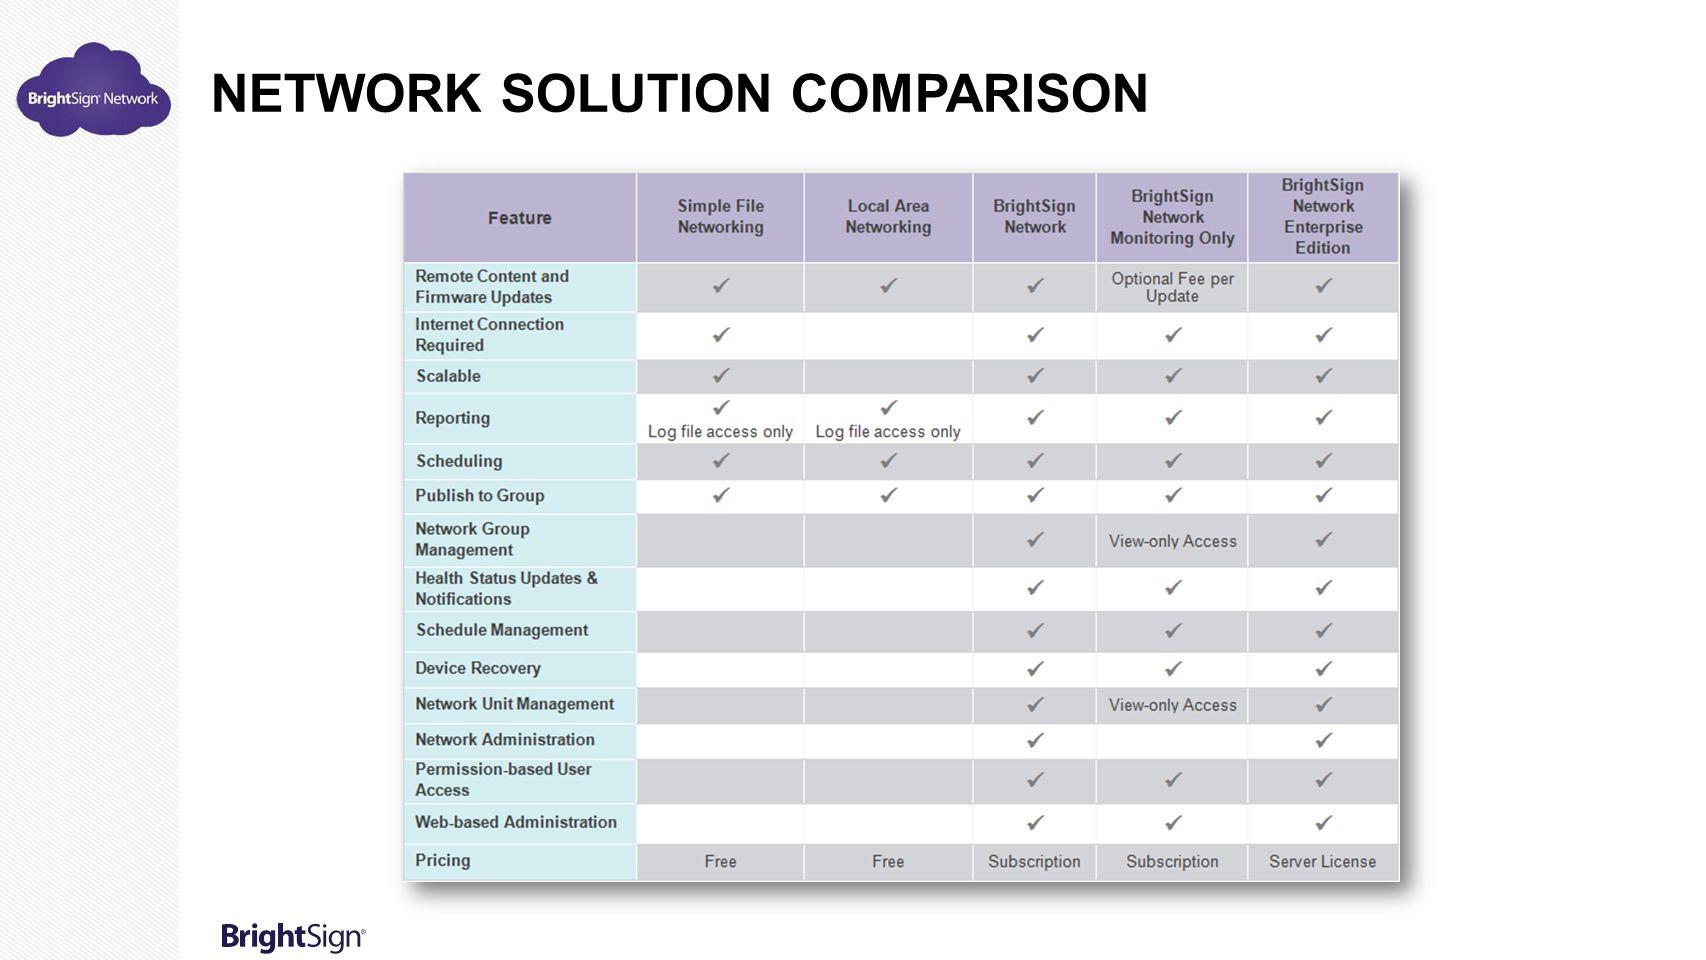 Network Solution Comparison